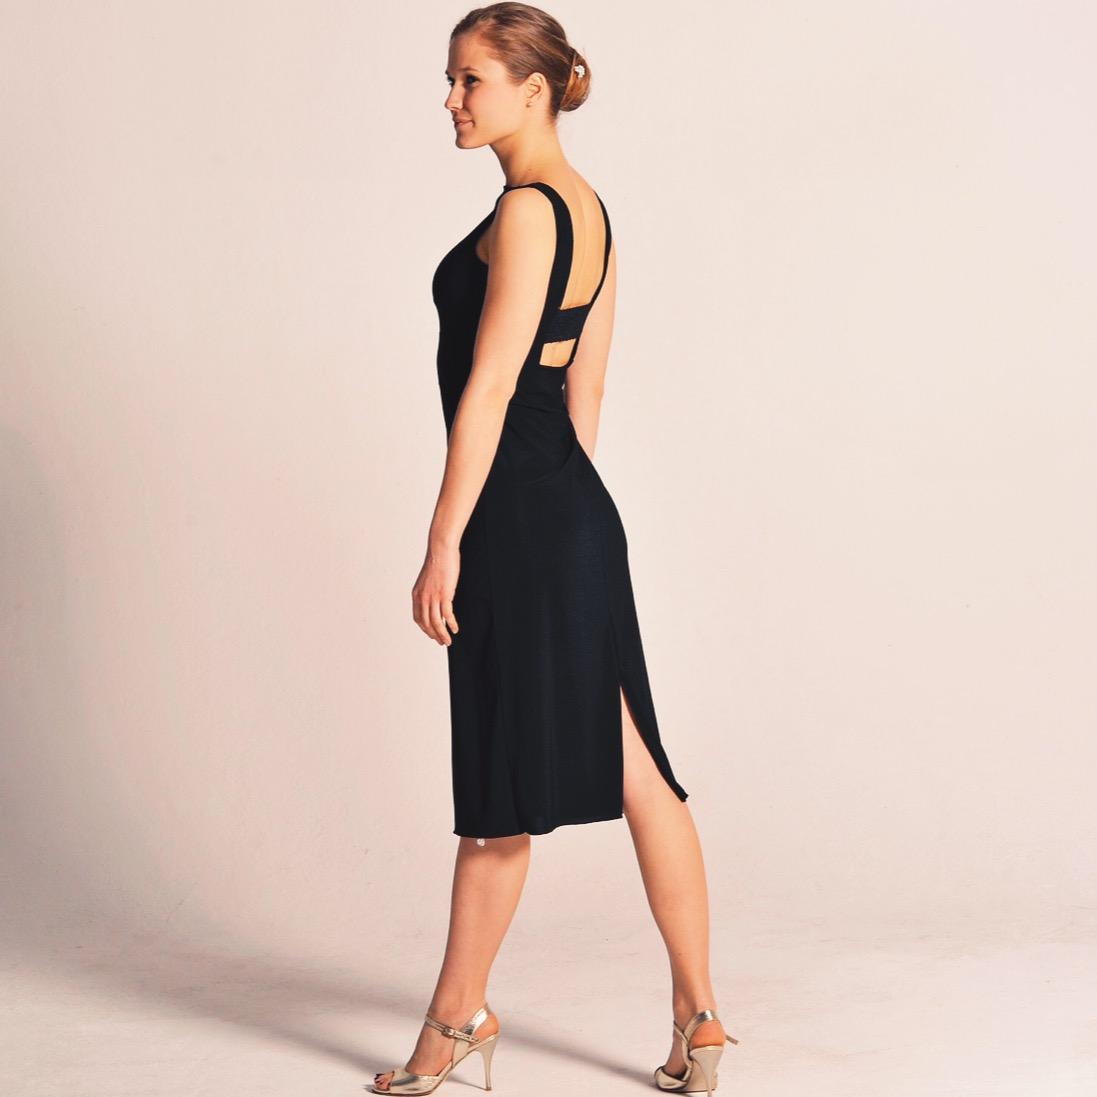 OLIVIA_black_tango_dress_coleccionberlin.JPG